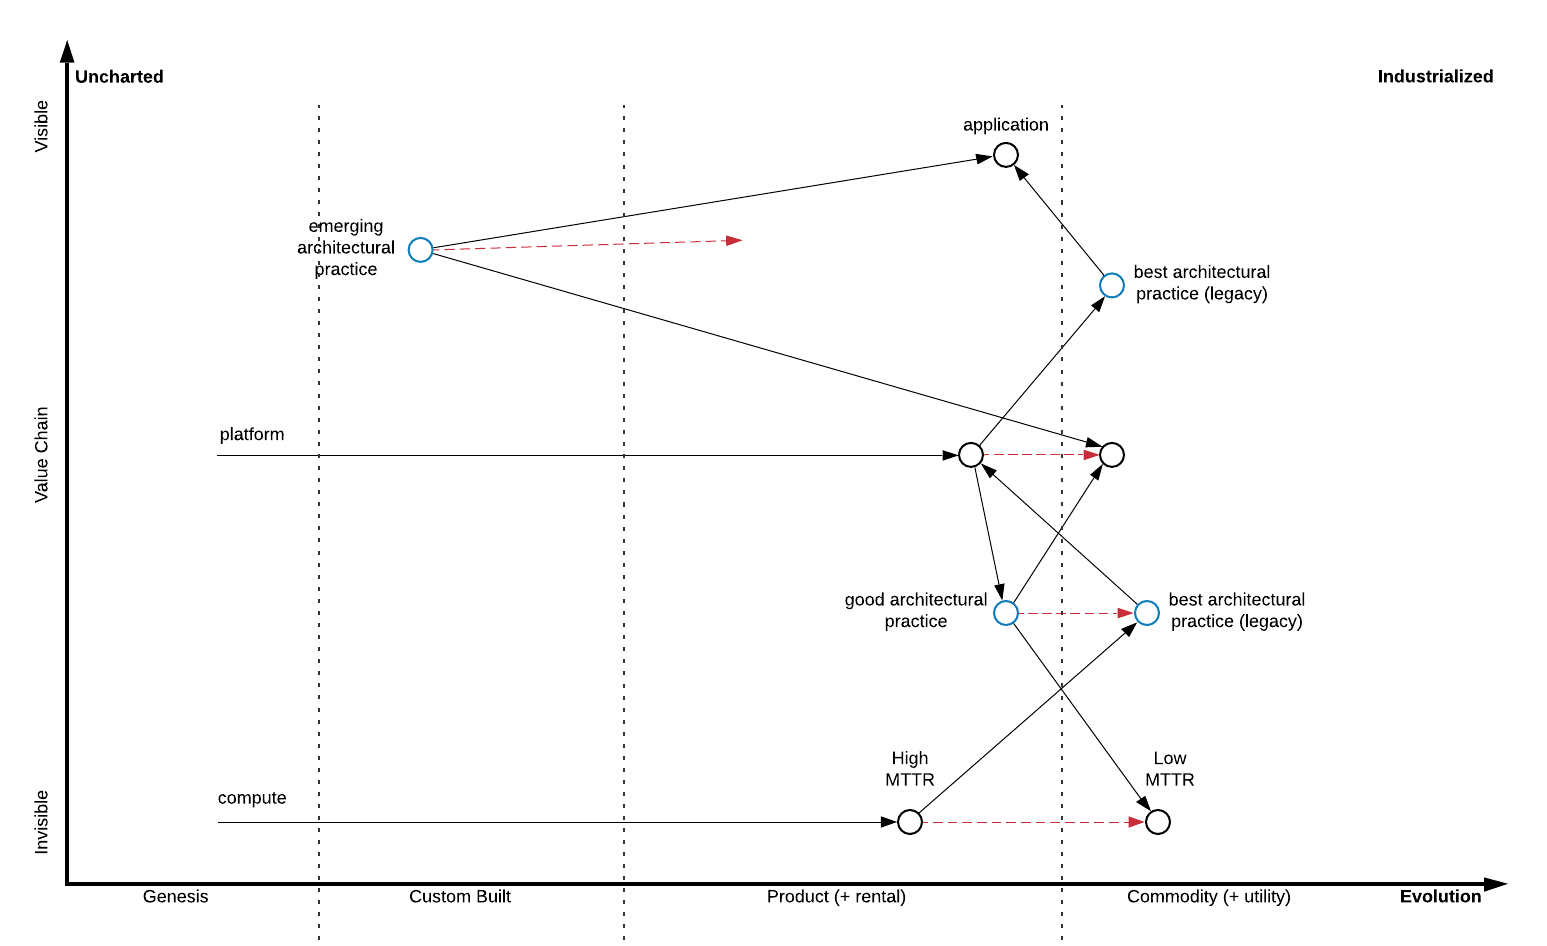 Wardley maps